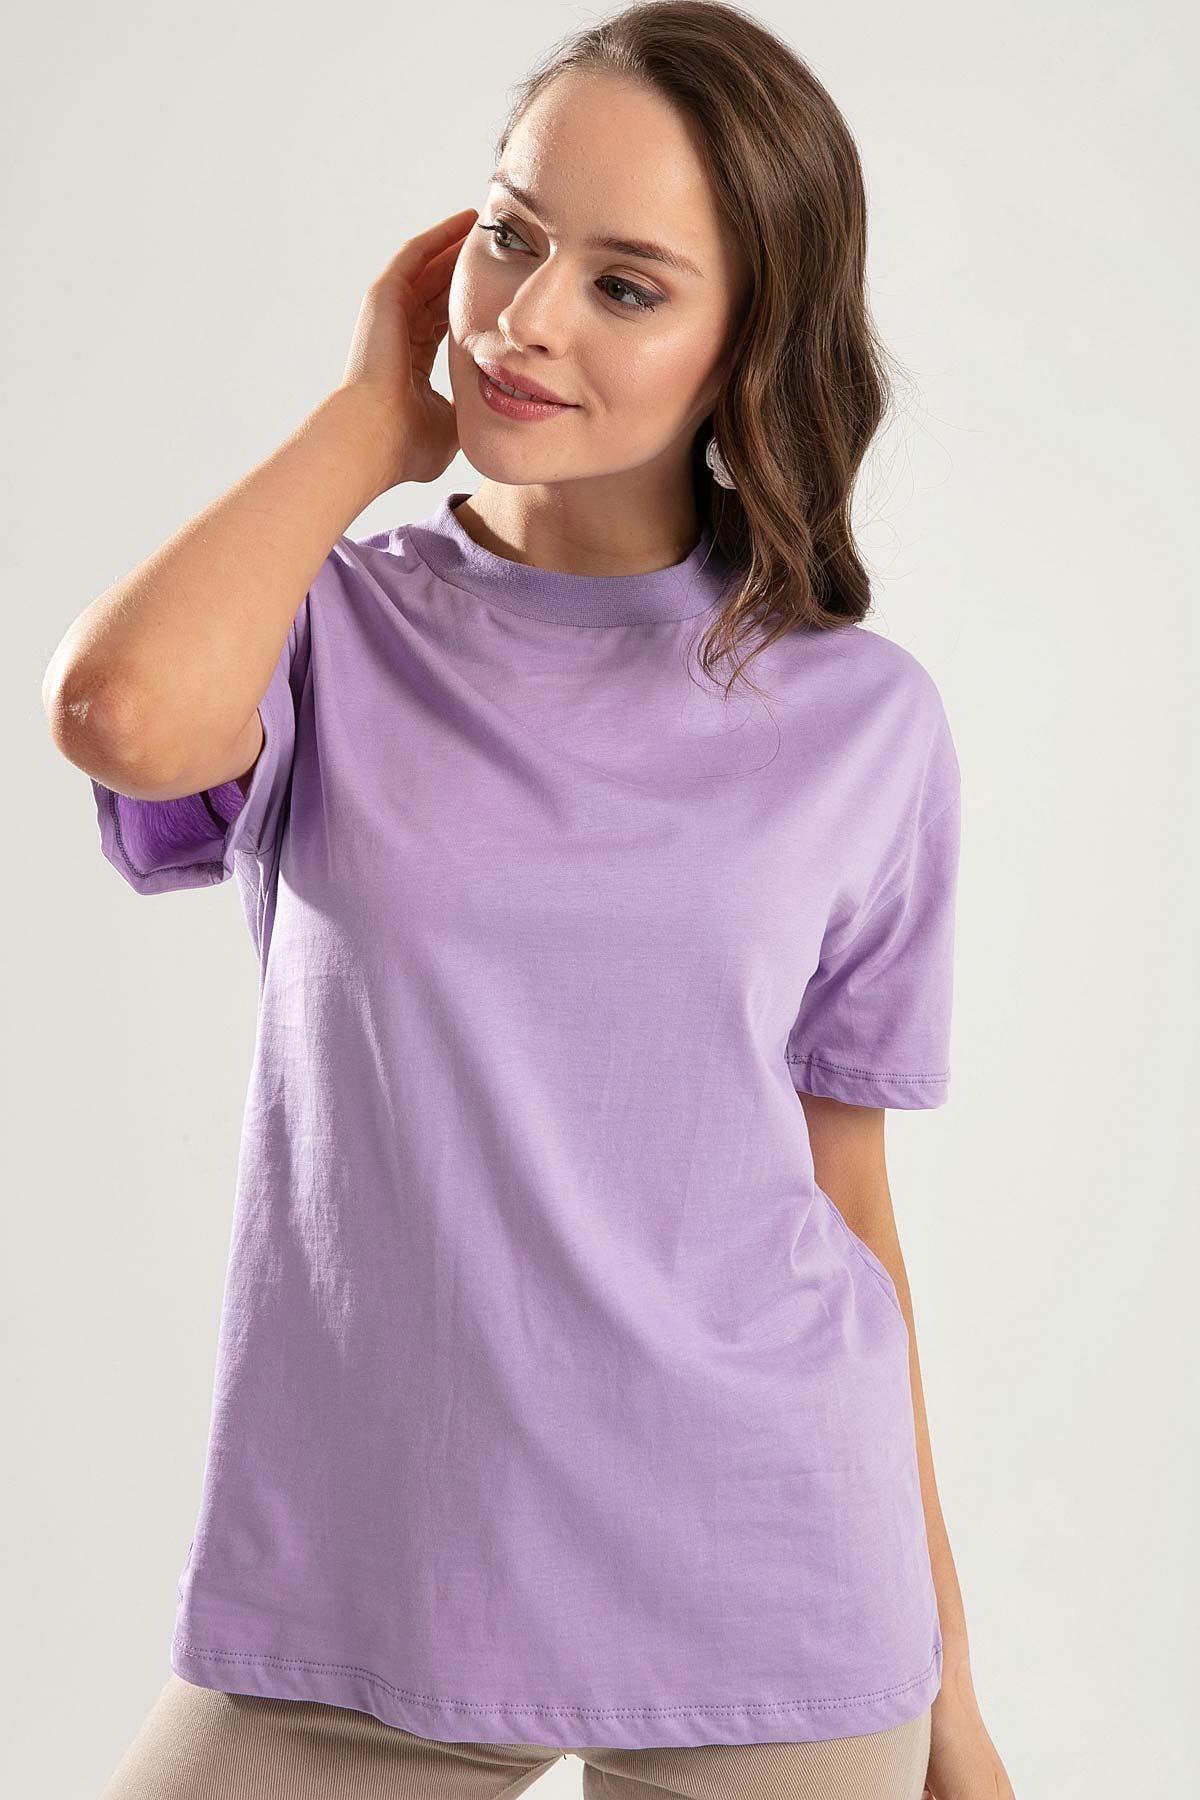 Pattaya Kadın Lila Dik Yaka Basic Tişört PTTY20S-701 0